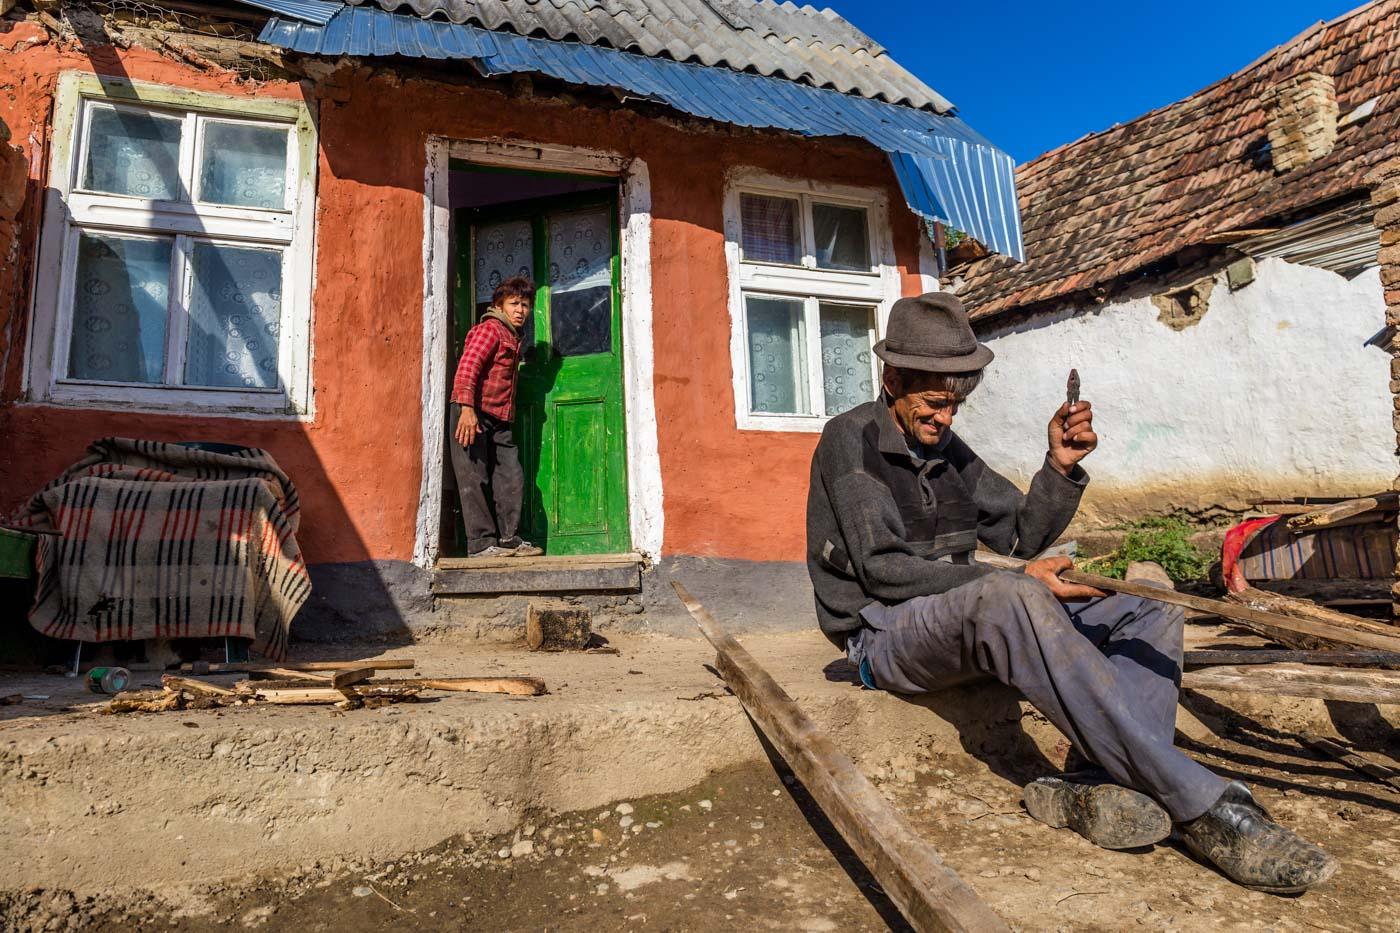 Roma family, Transylvania, Romania